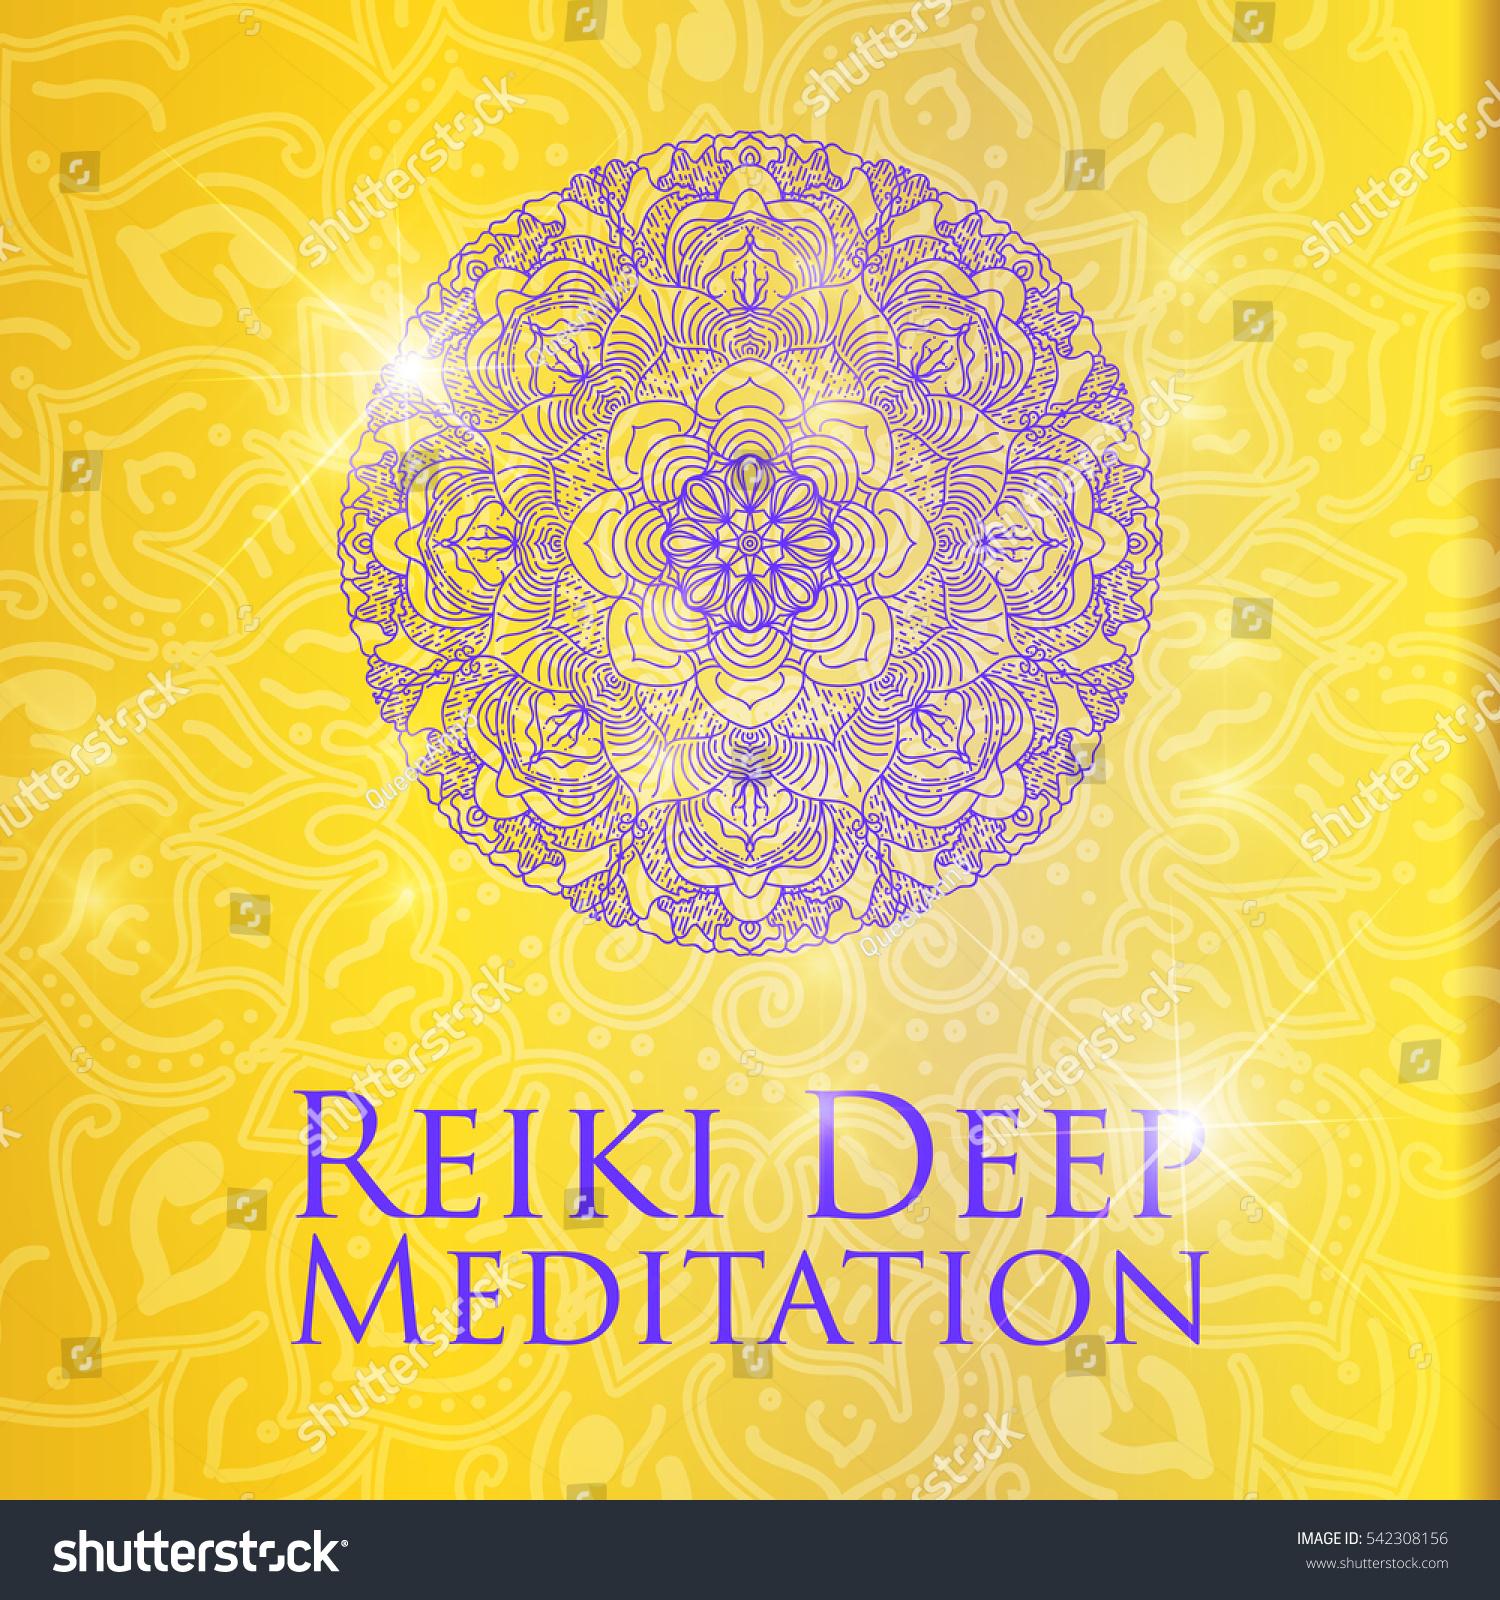 Sacred geometry reiki symbol word reiki stock vector 542308156 sacred geometry reiki symbol the word reiki is made up of two japanese words biocorpaavc